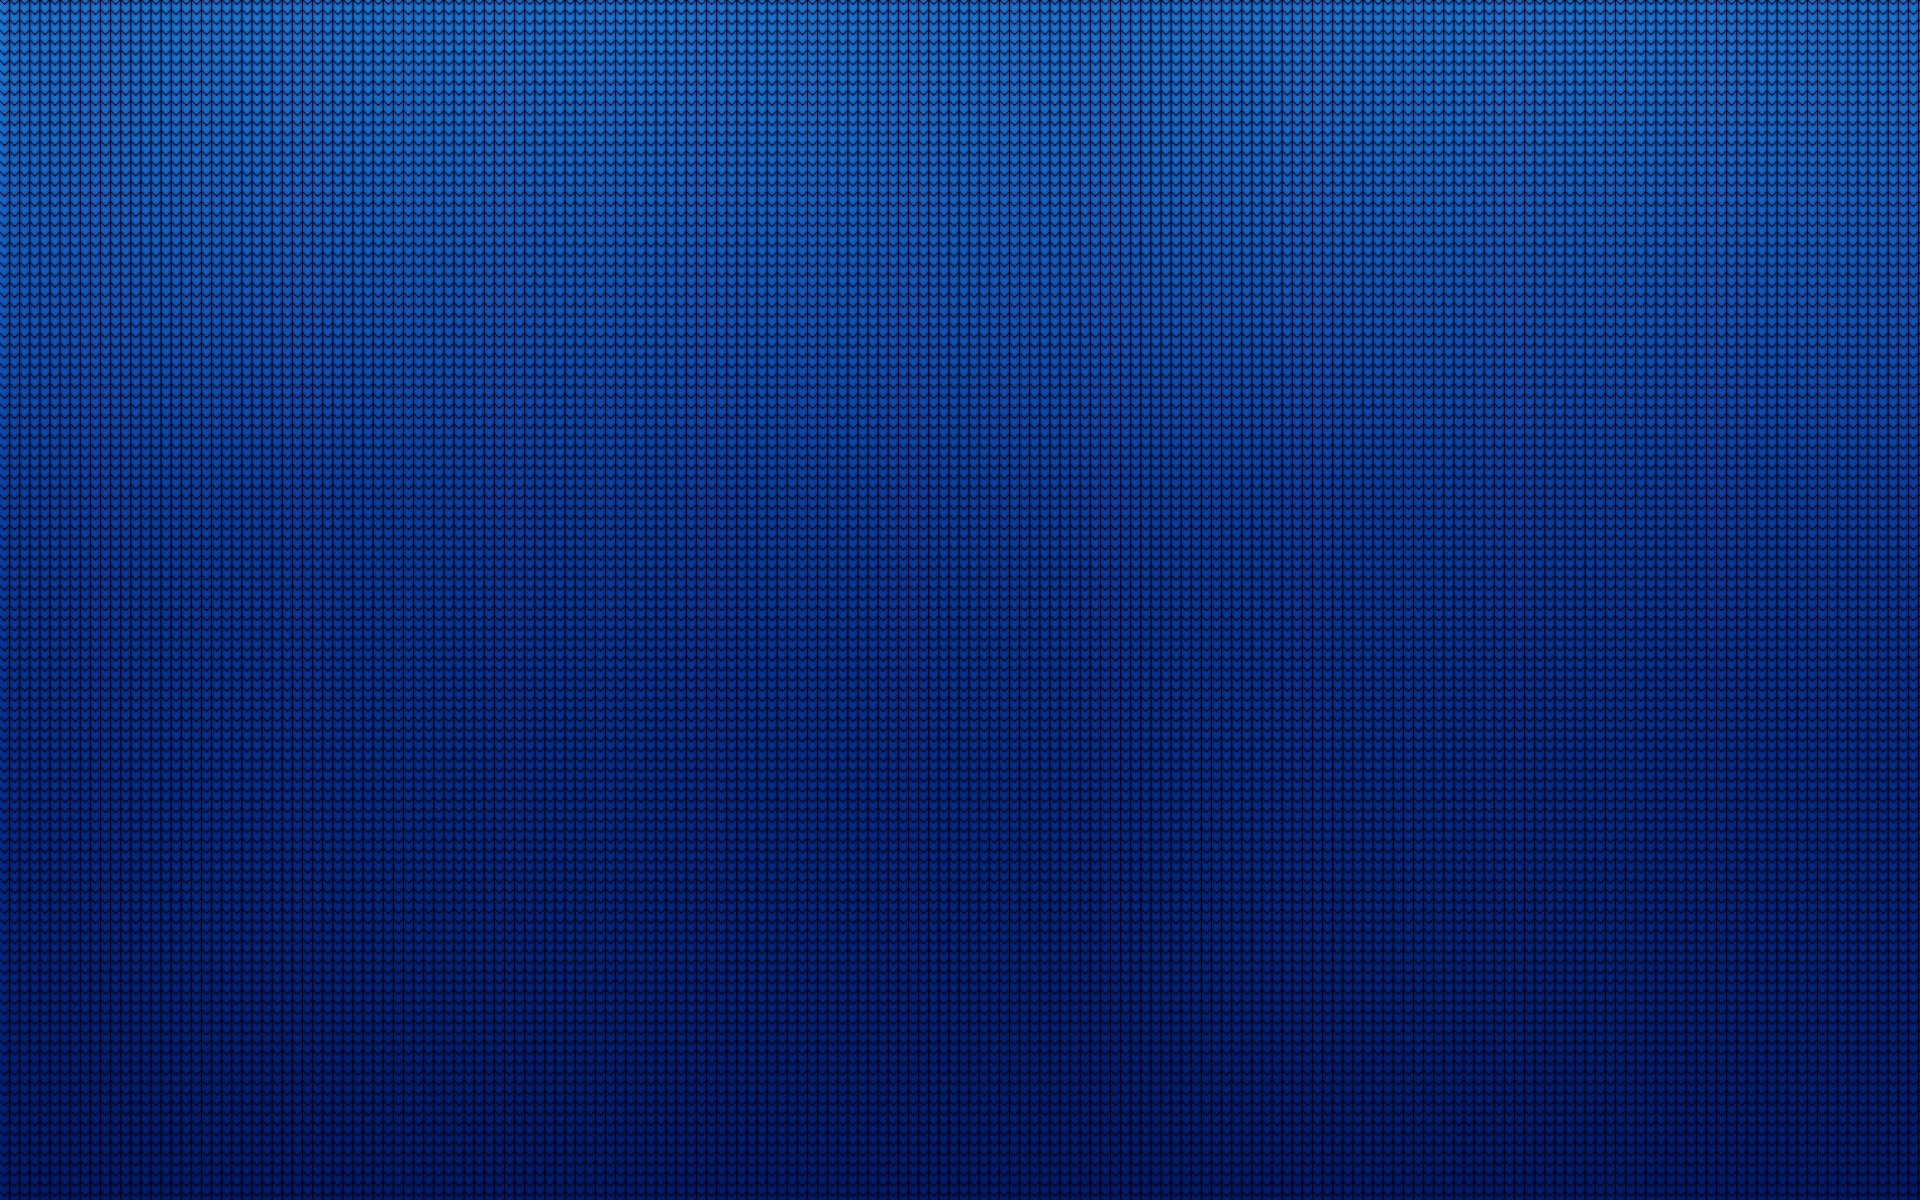 Blue background wallpaper 8392876 biomedical engineering voltagebd Images